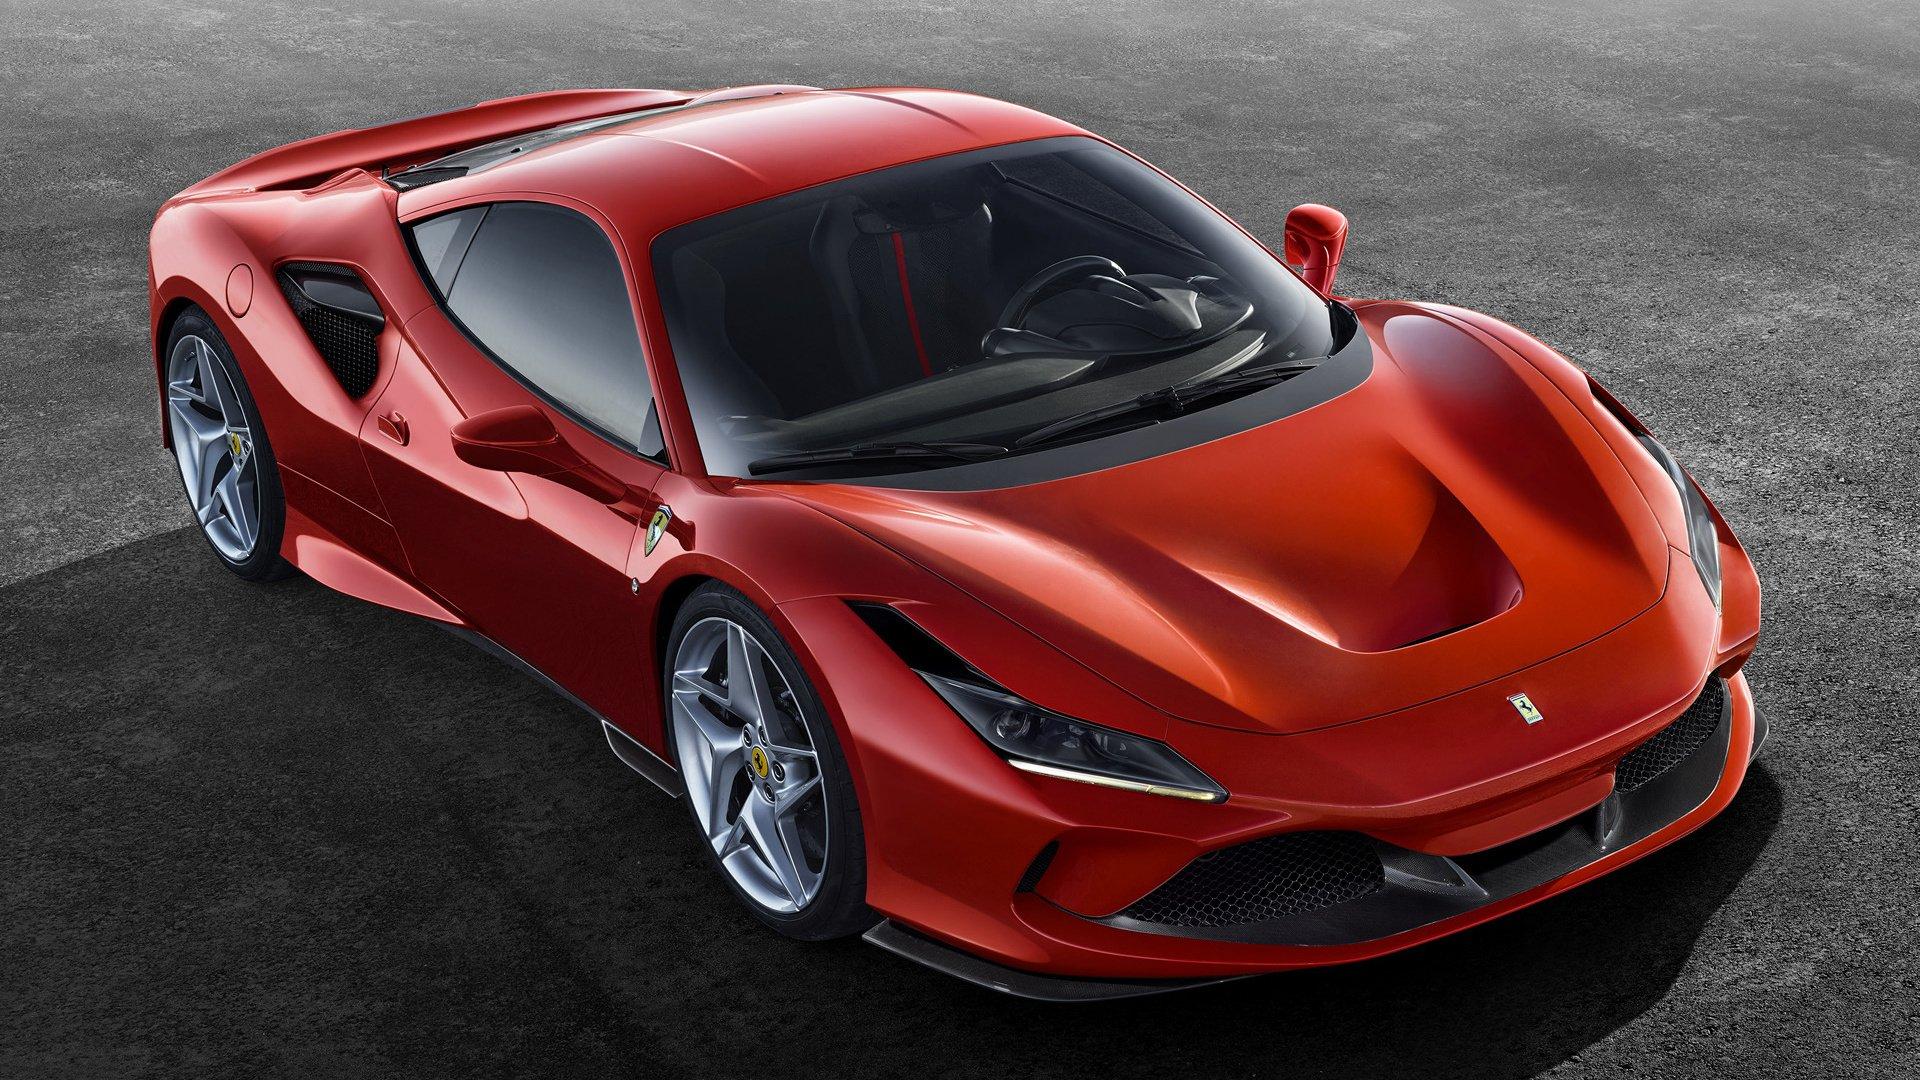 2019 Ferrari F8 Tributo Fondo De Pantalla Hd Fondo De